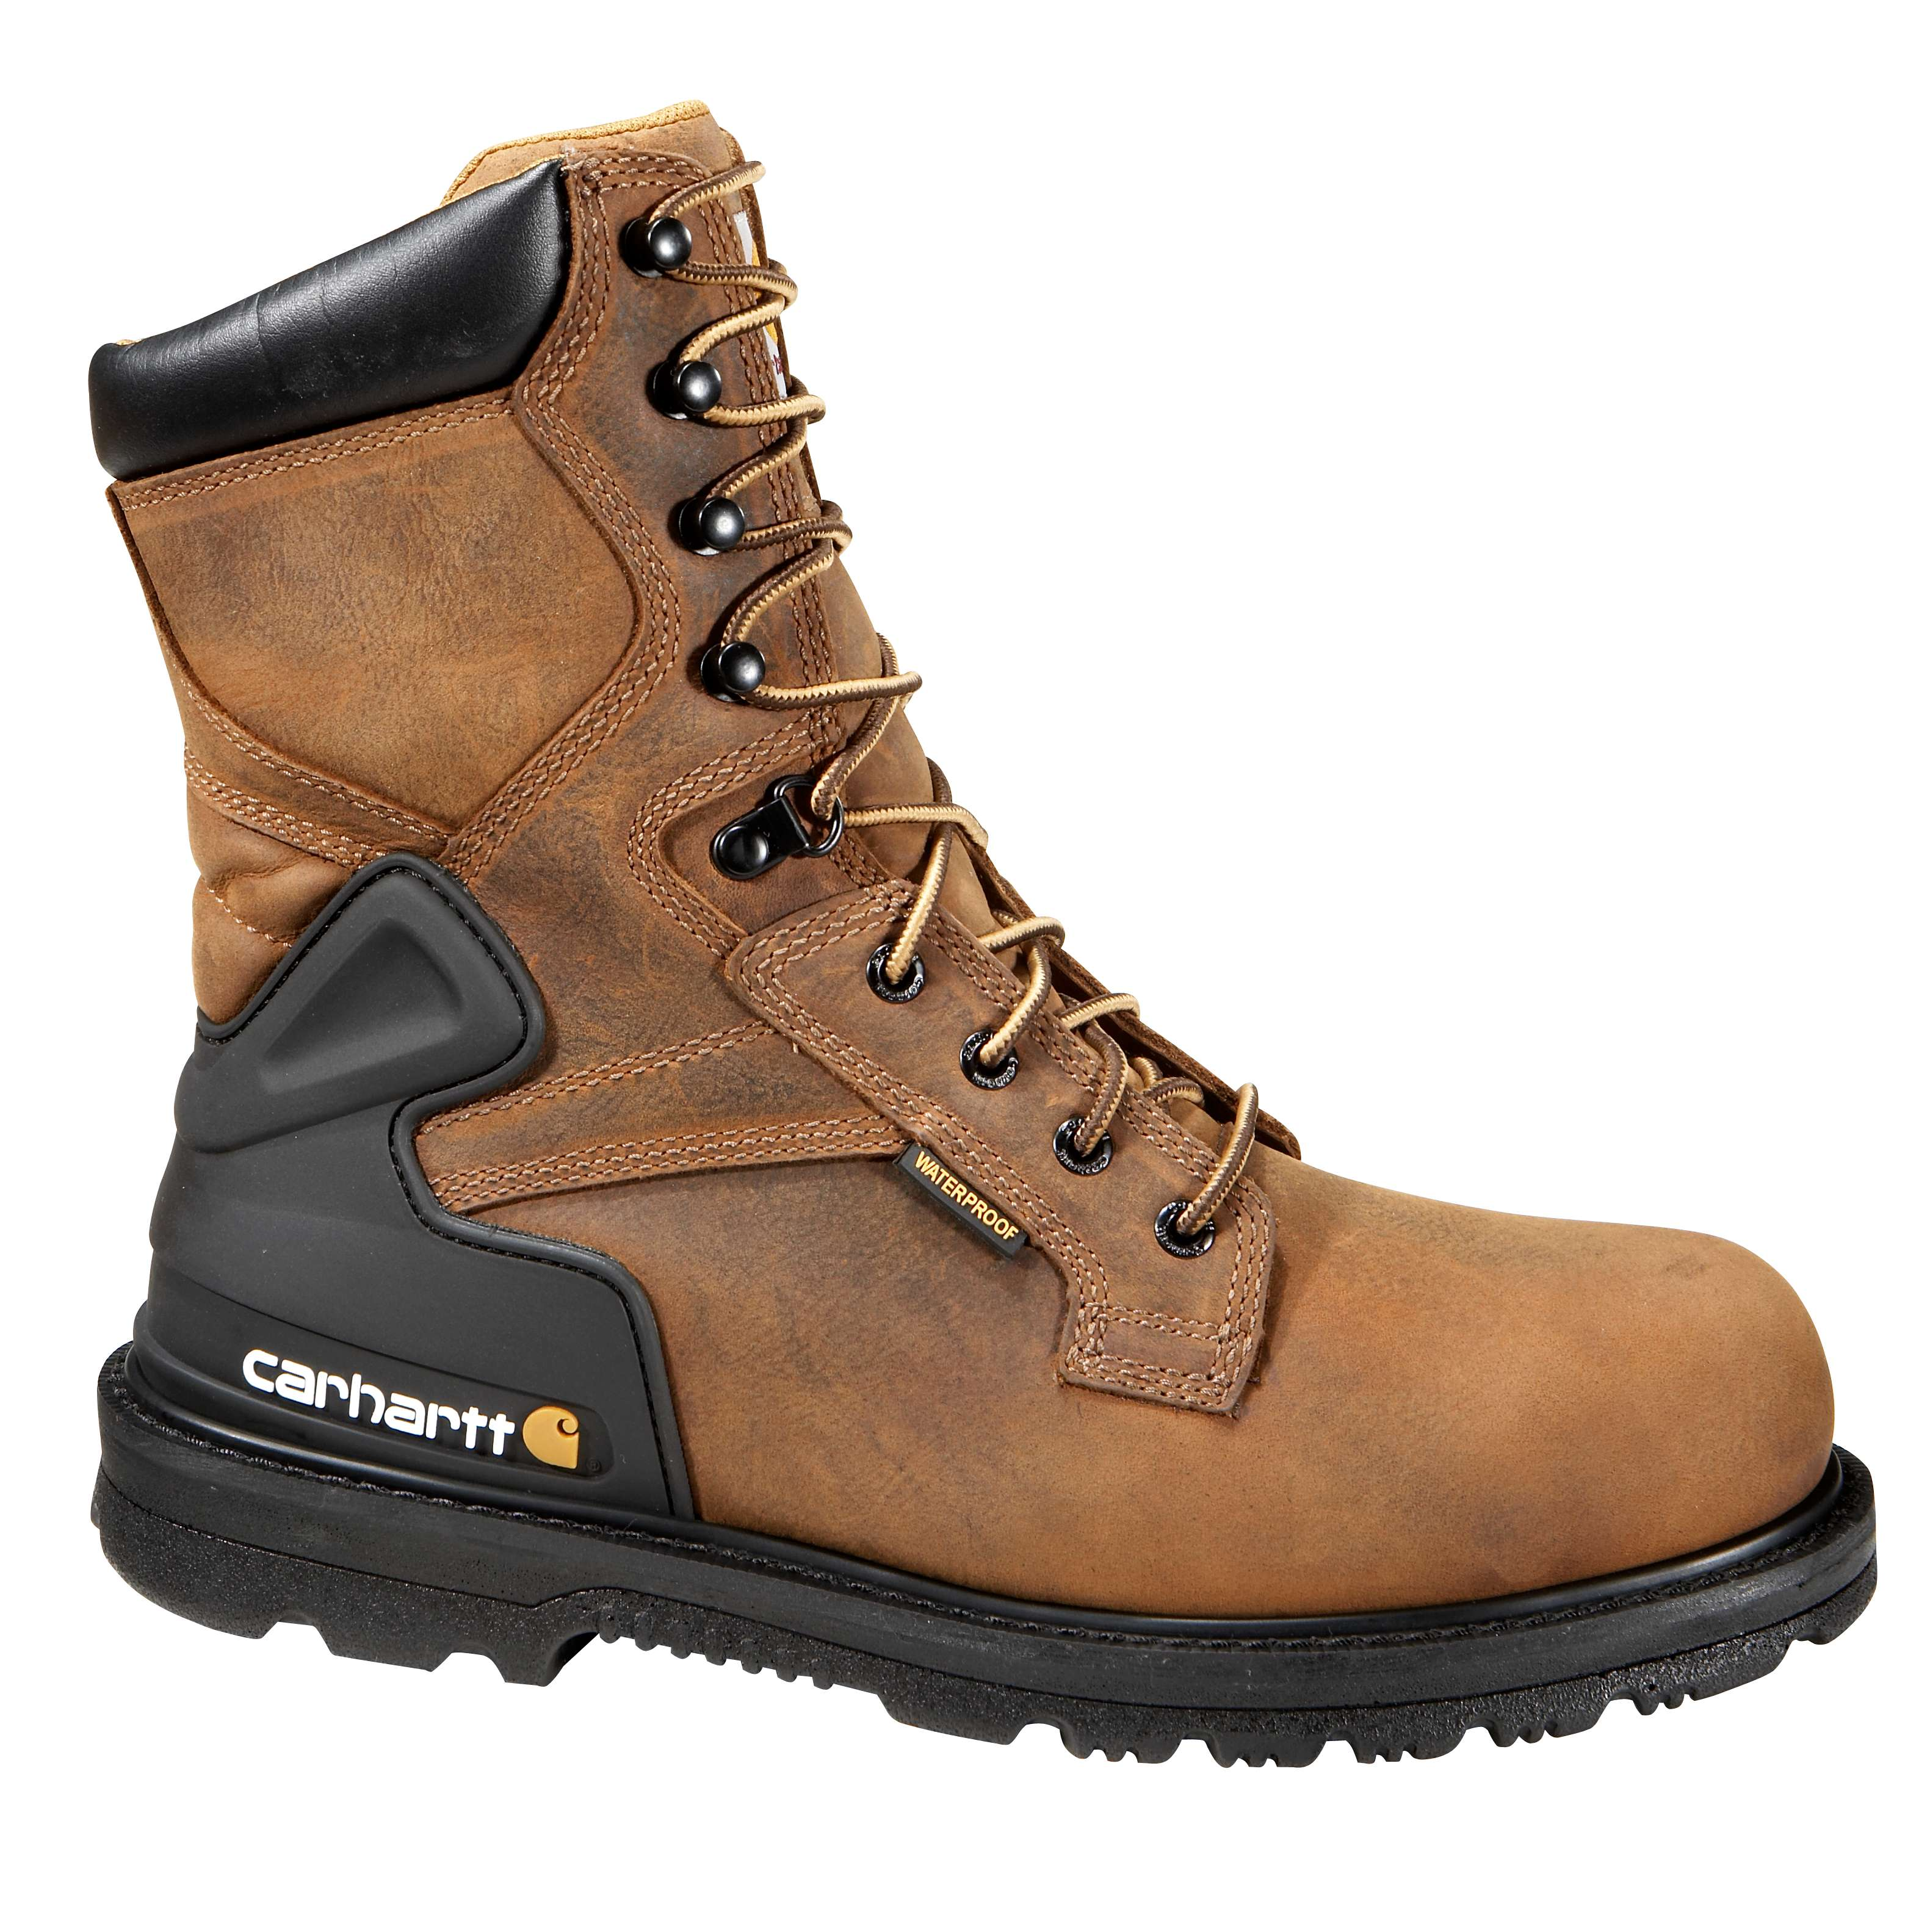 Carhartt 8-Inch Steel Toe Work Boot